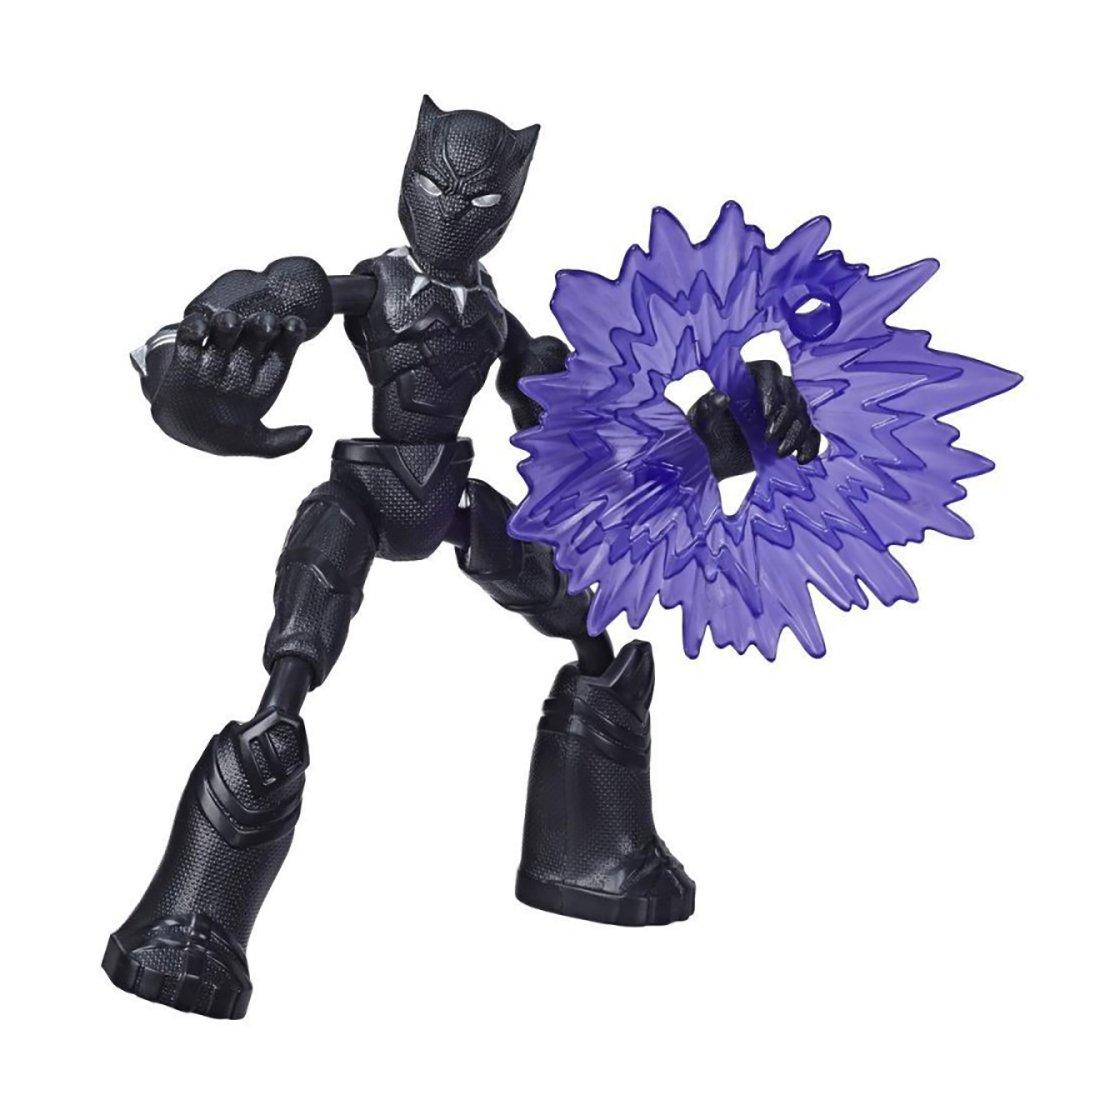 Figurina flexibila Avengers Bend and Flex, Black Panther (E7868) imagine